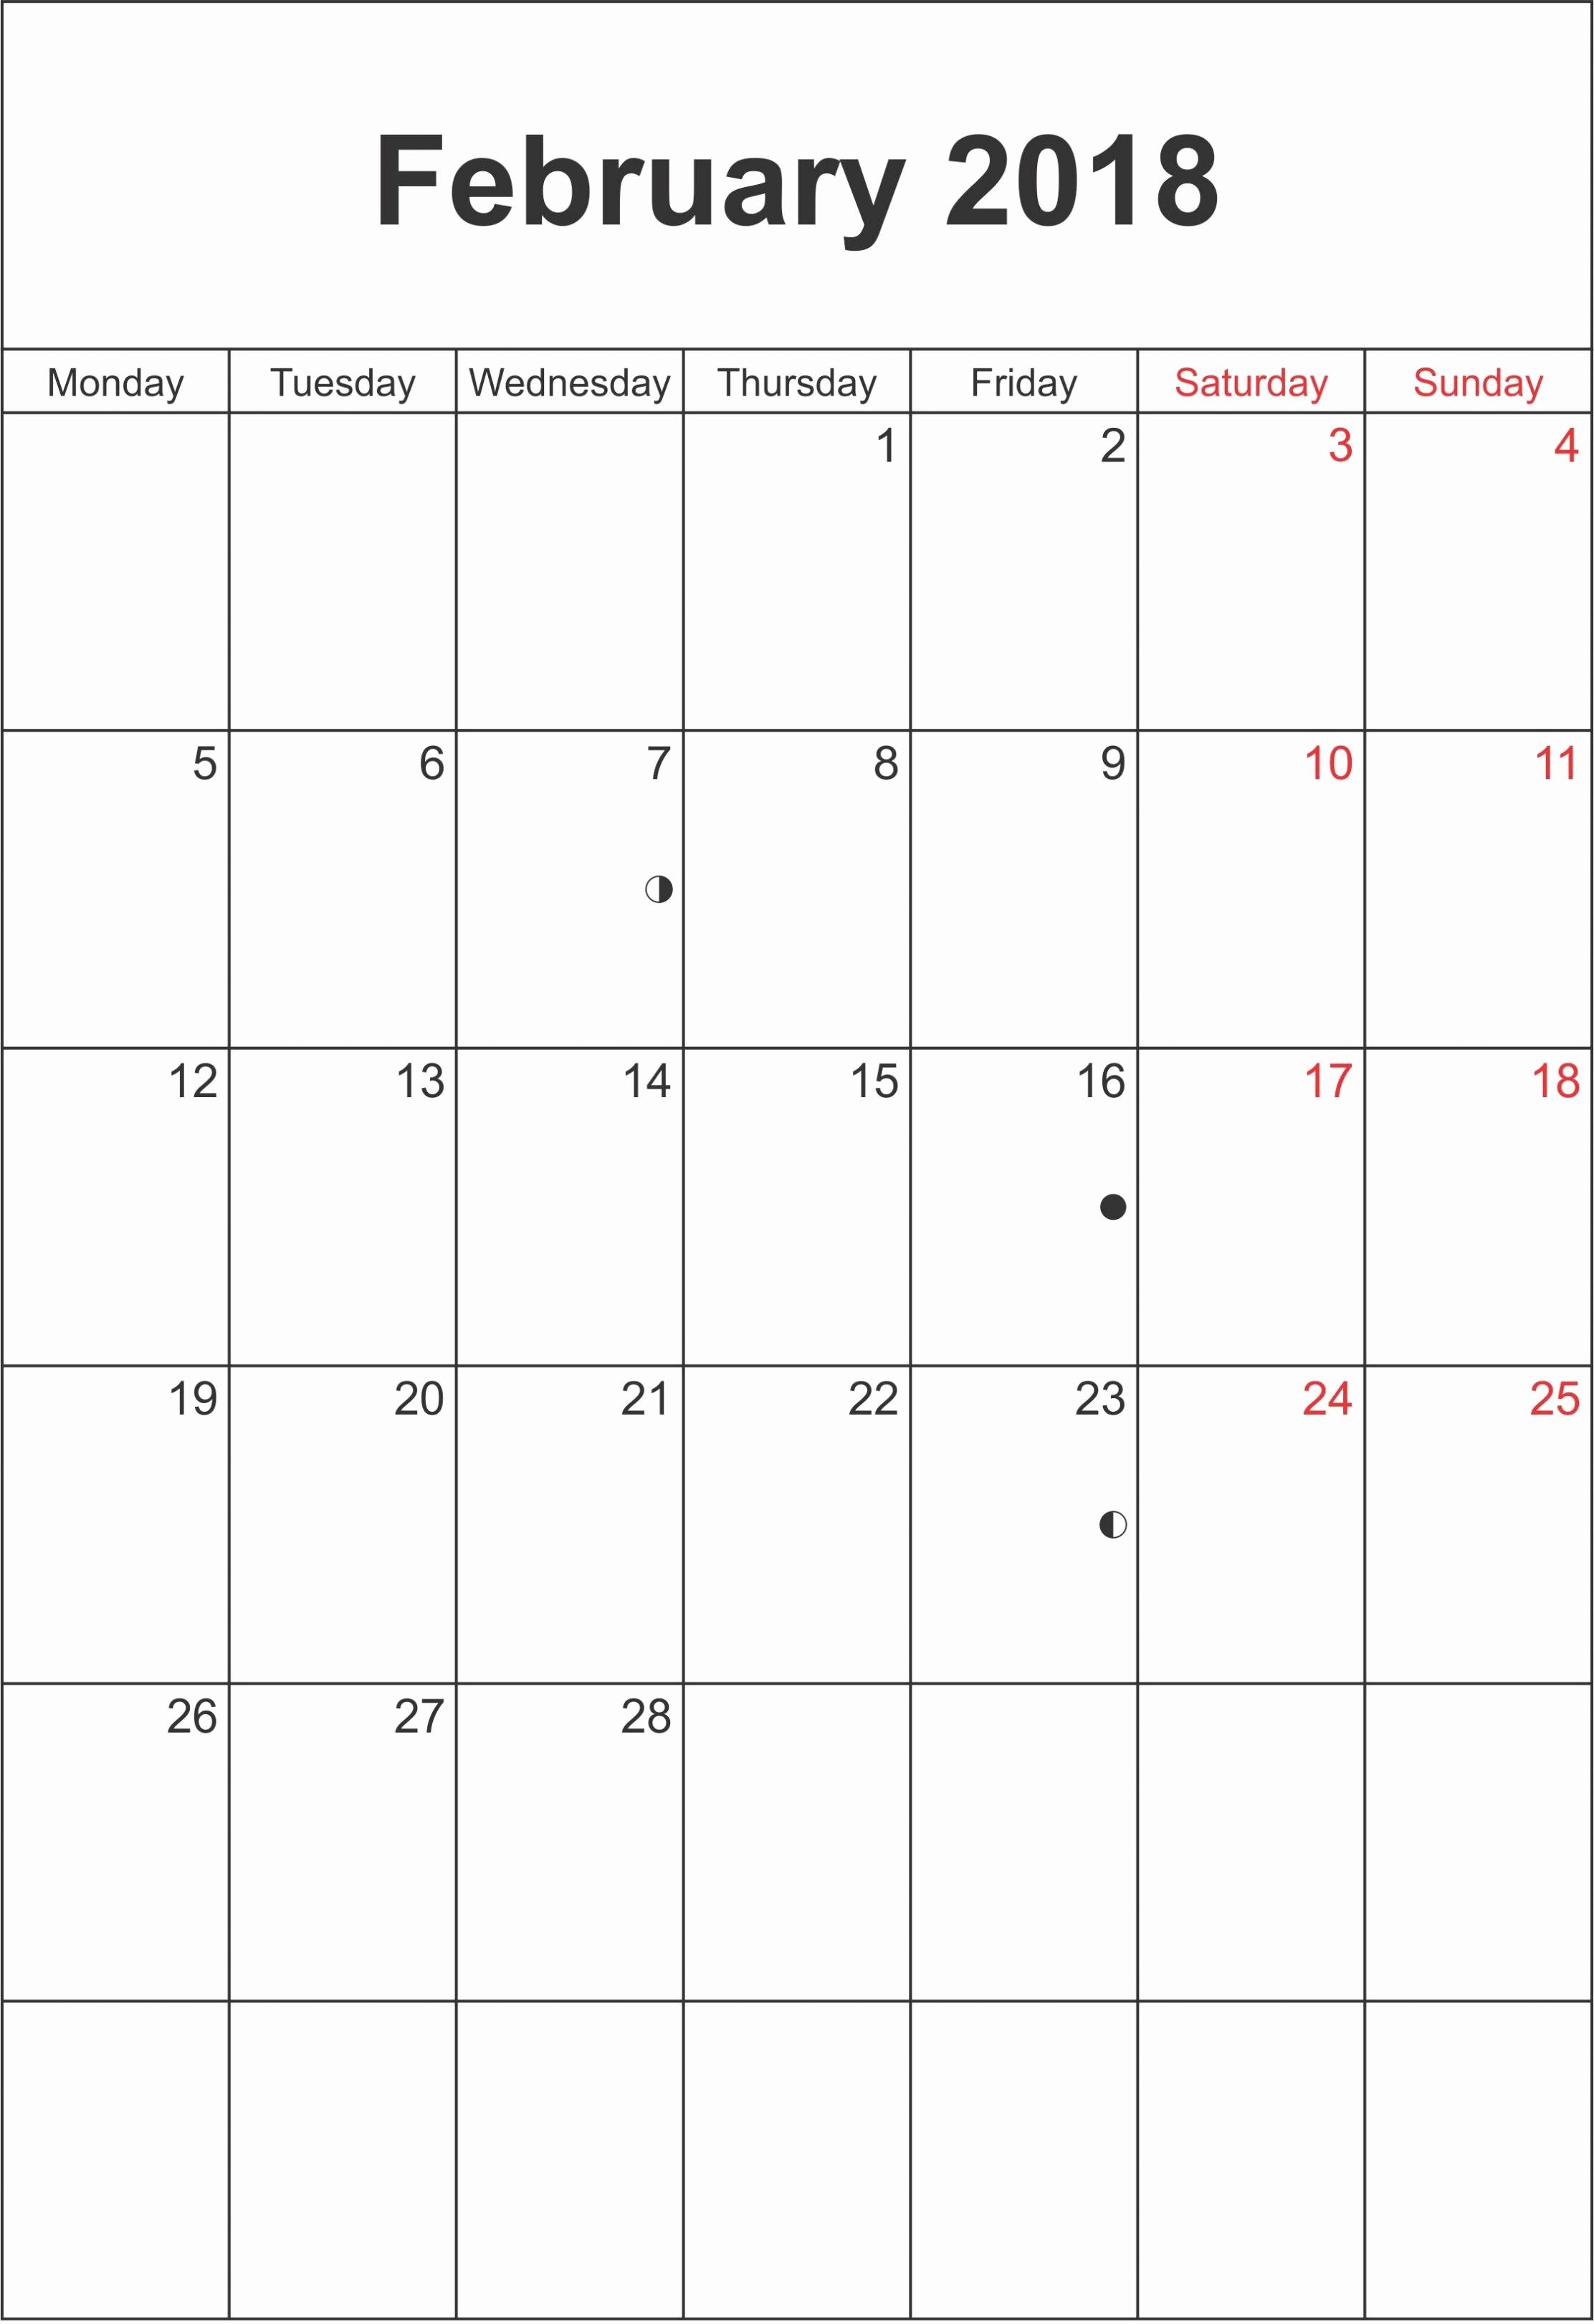 Printable Calendar December 2018 Landscape Luxury February 2018 Calendar Landscape & Portrait Printable